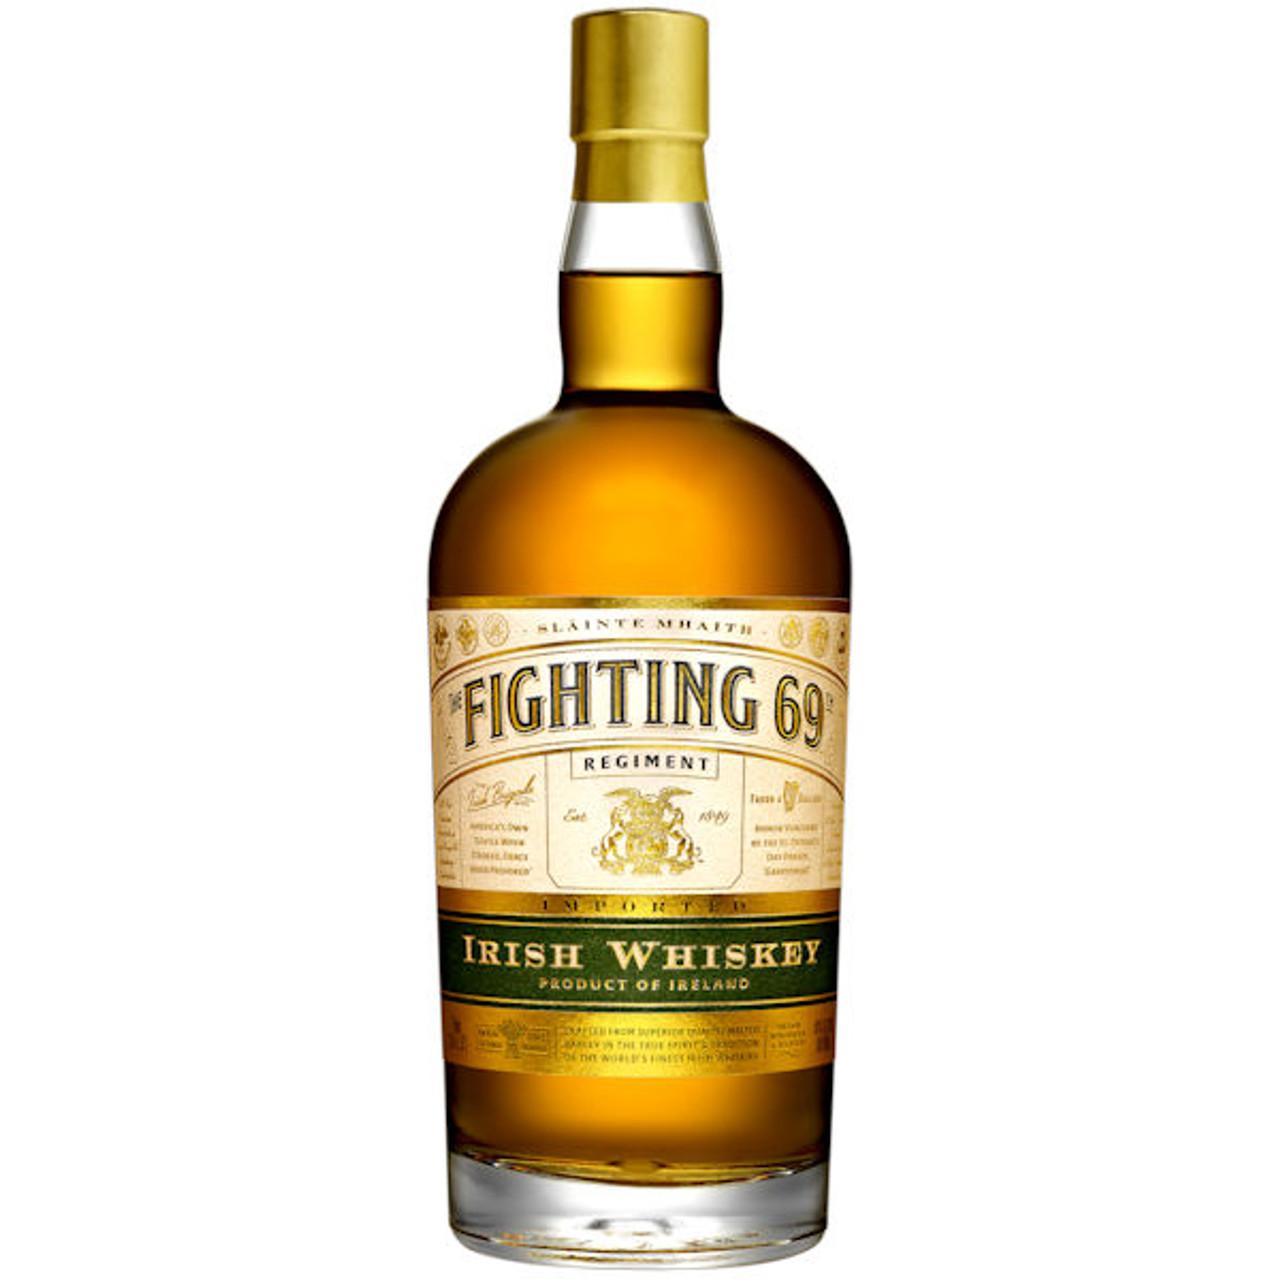 Fighting 69th Regiment Irish Whiskey 750ml